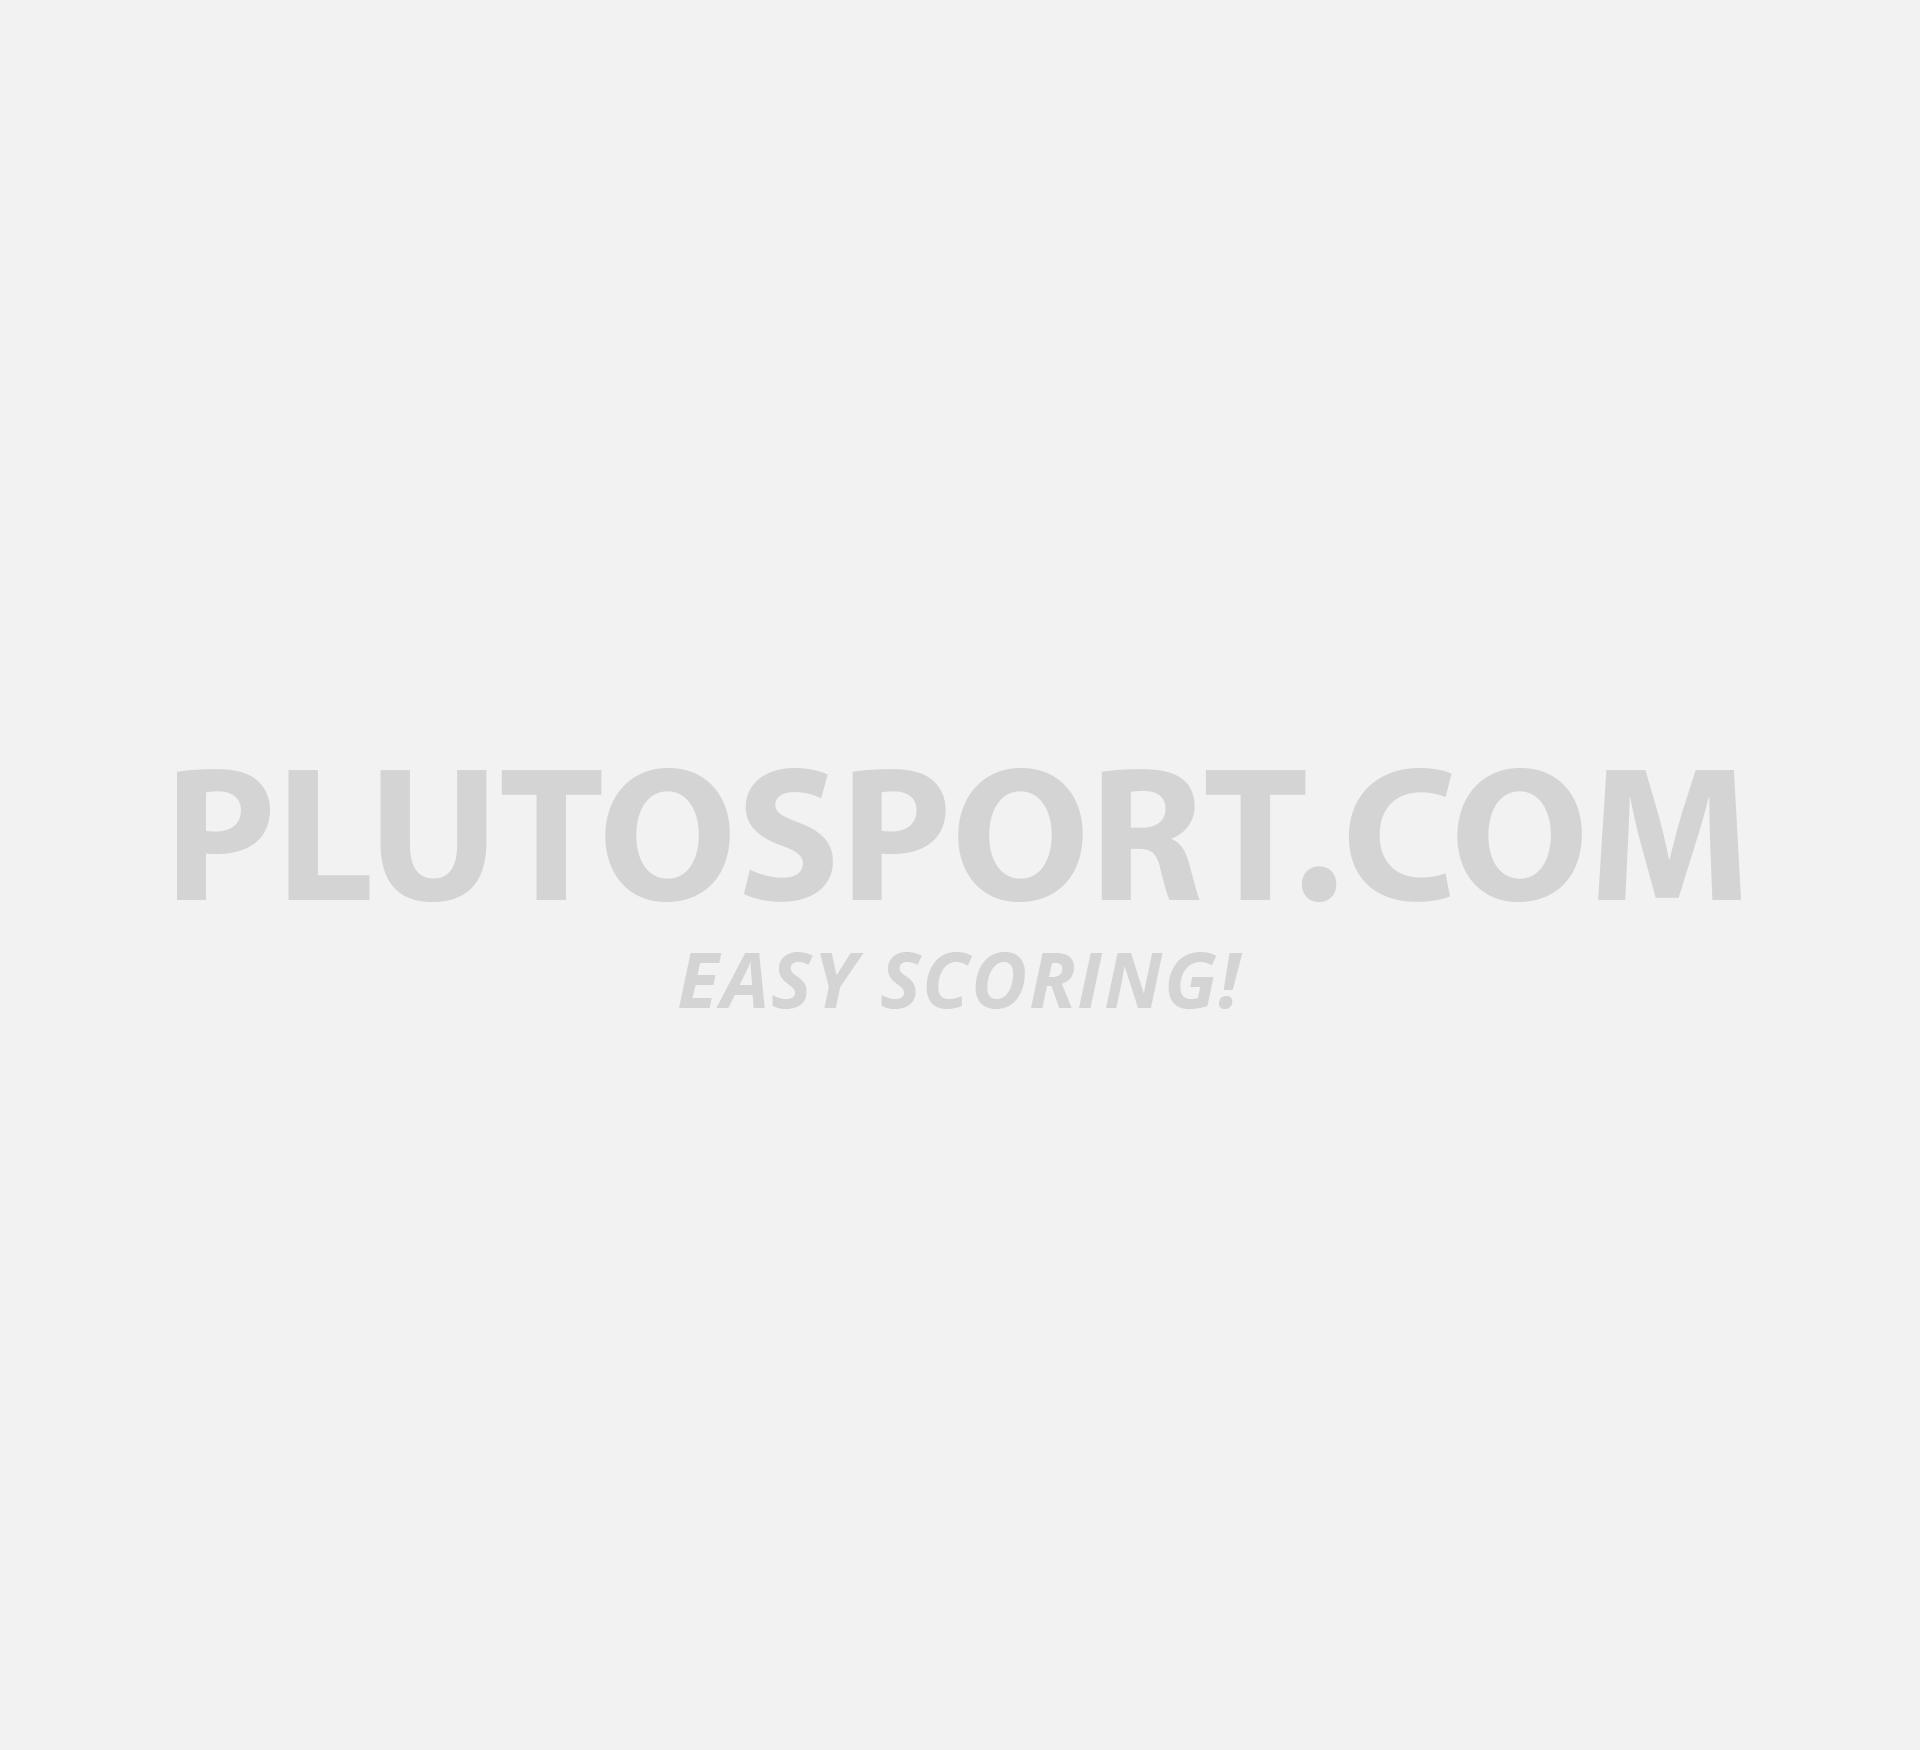 303f364ccc8 Adidas Barricade Cap Polo Wms - Polo shirts - Clothing - Tennis - Sports |  Plutosport